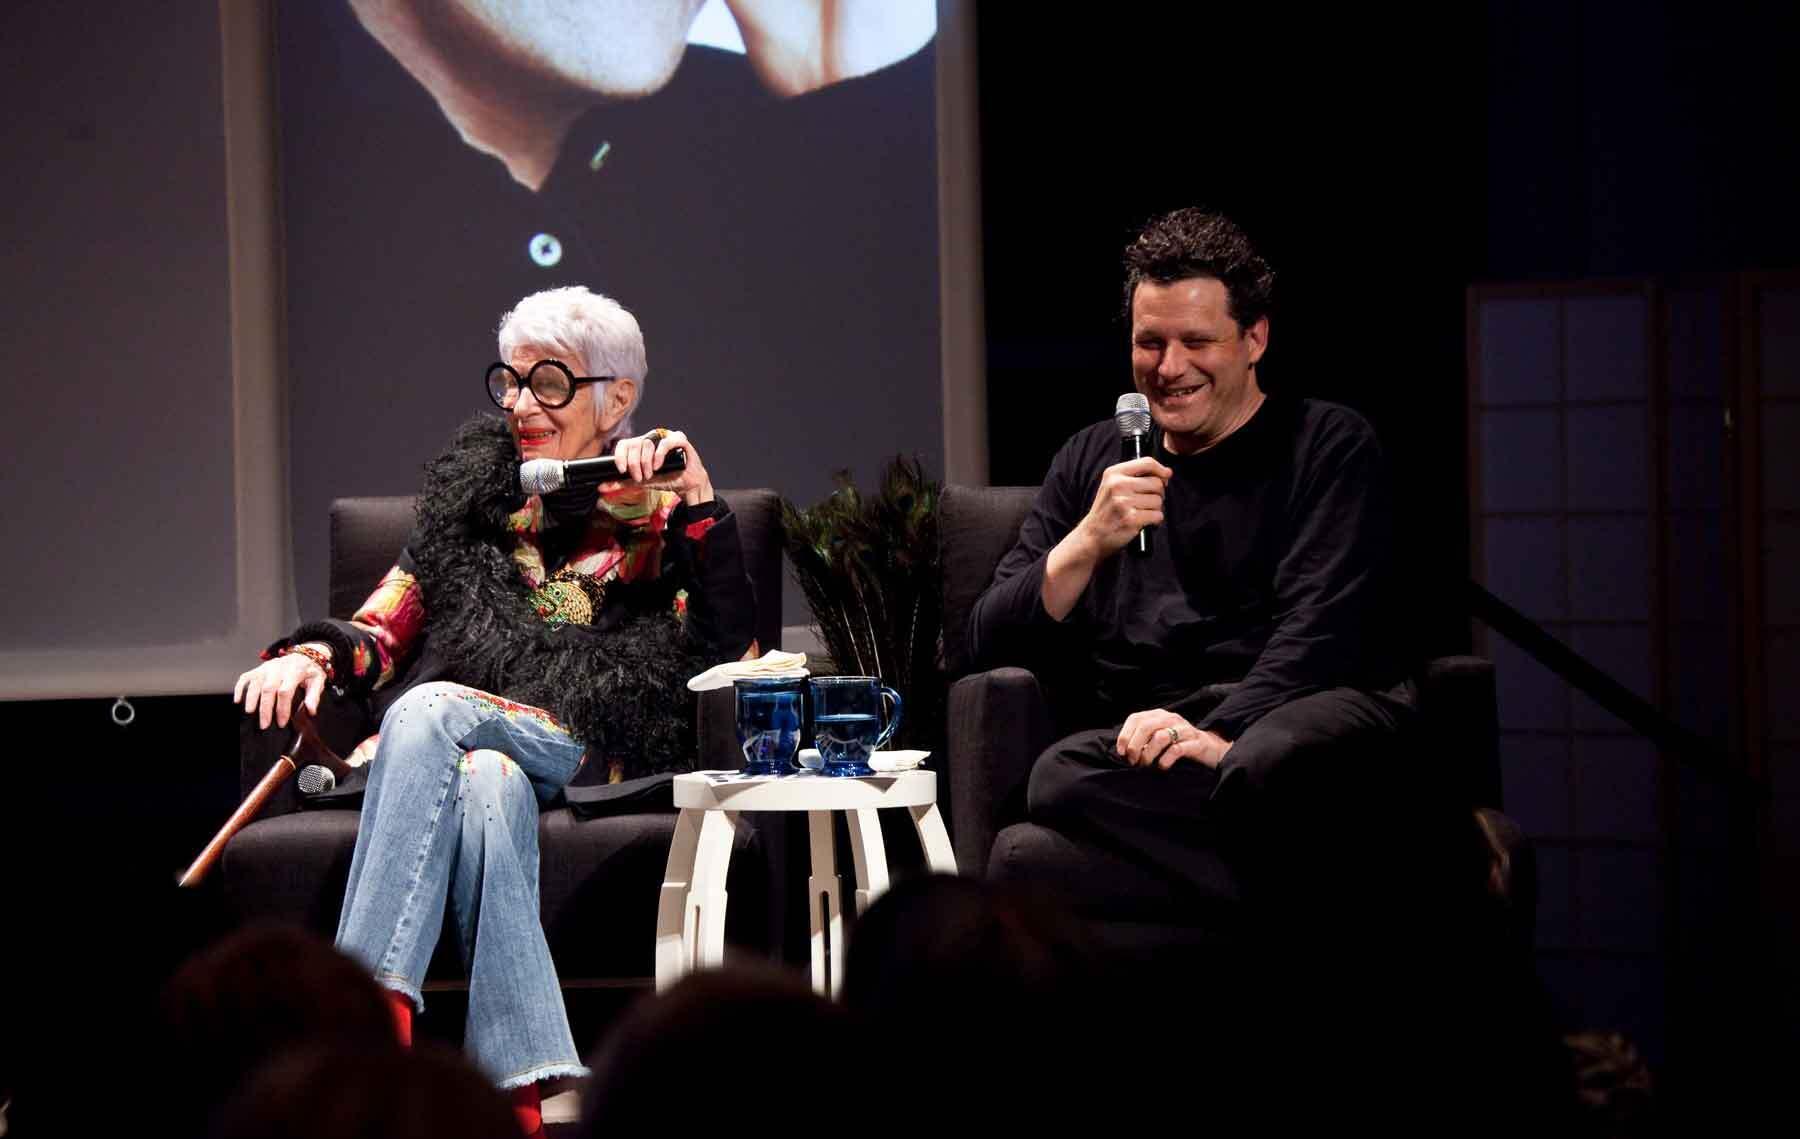 Iris Apfel and Isaac Mizrahi in a program at PEM in 2009. Photo by Kathy Tarantola/PEM.